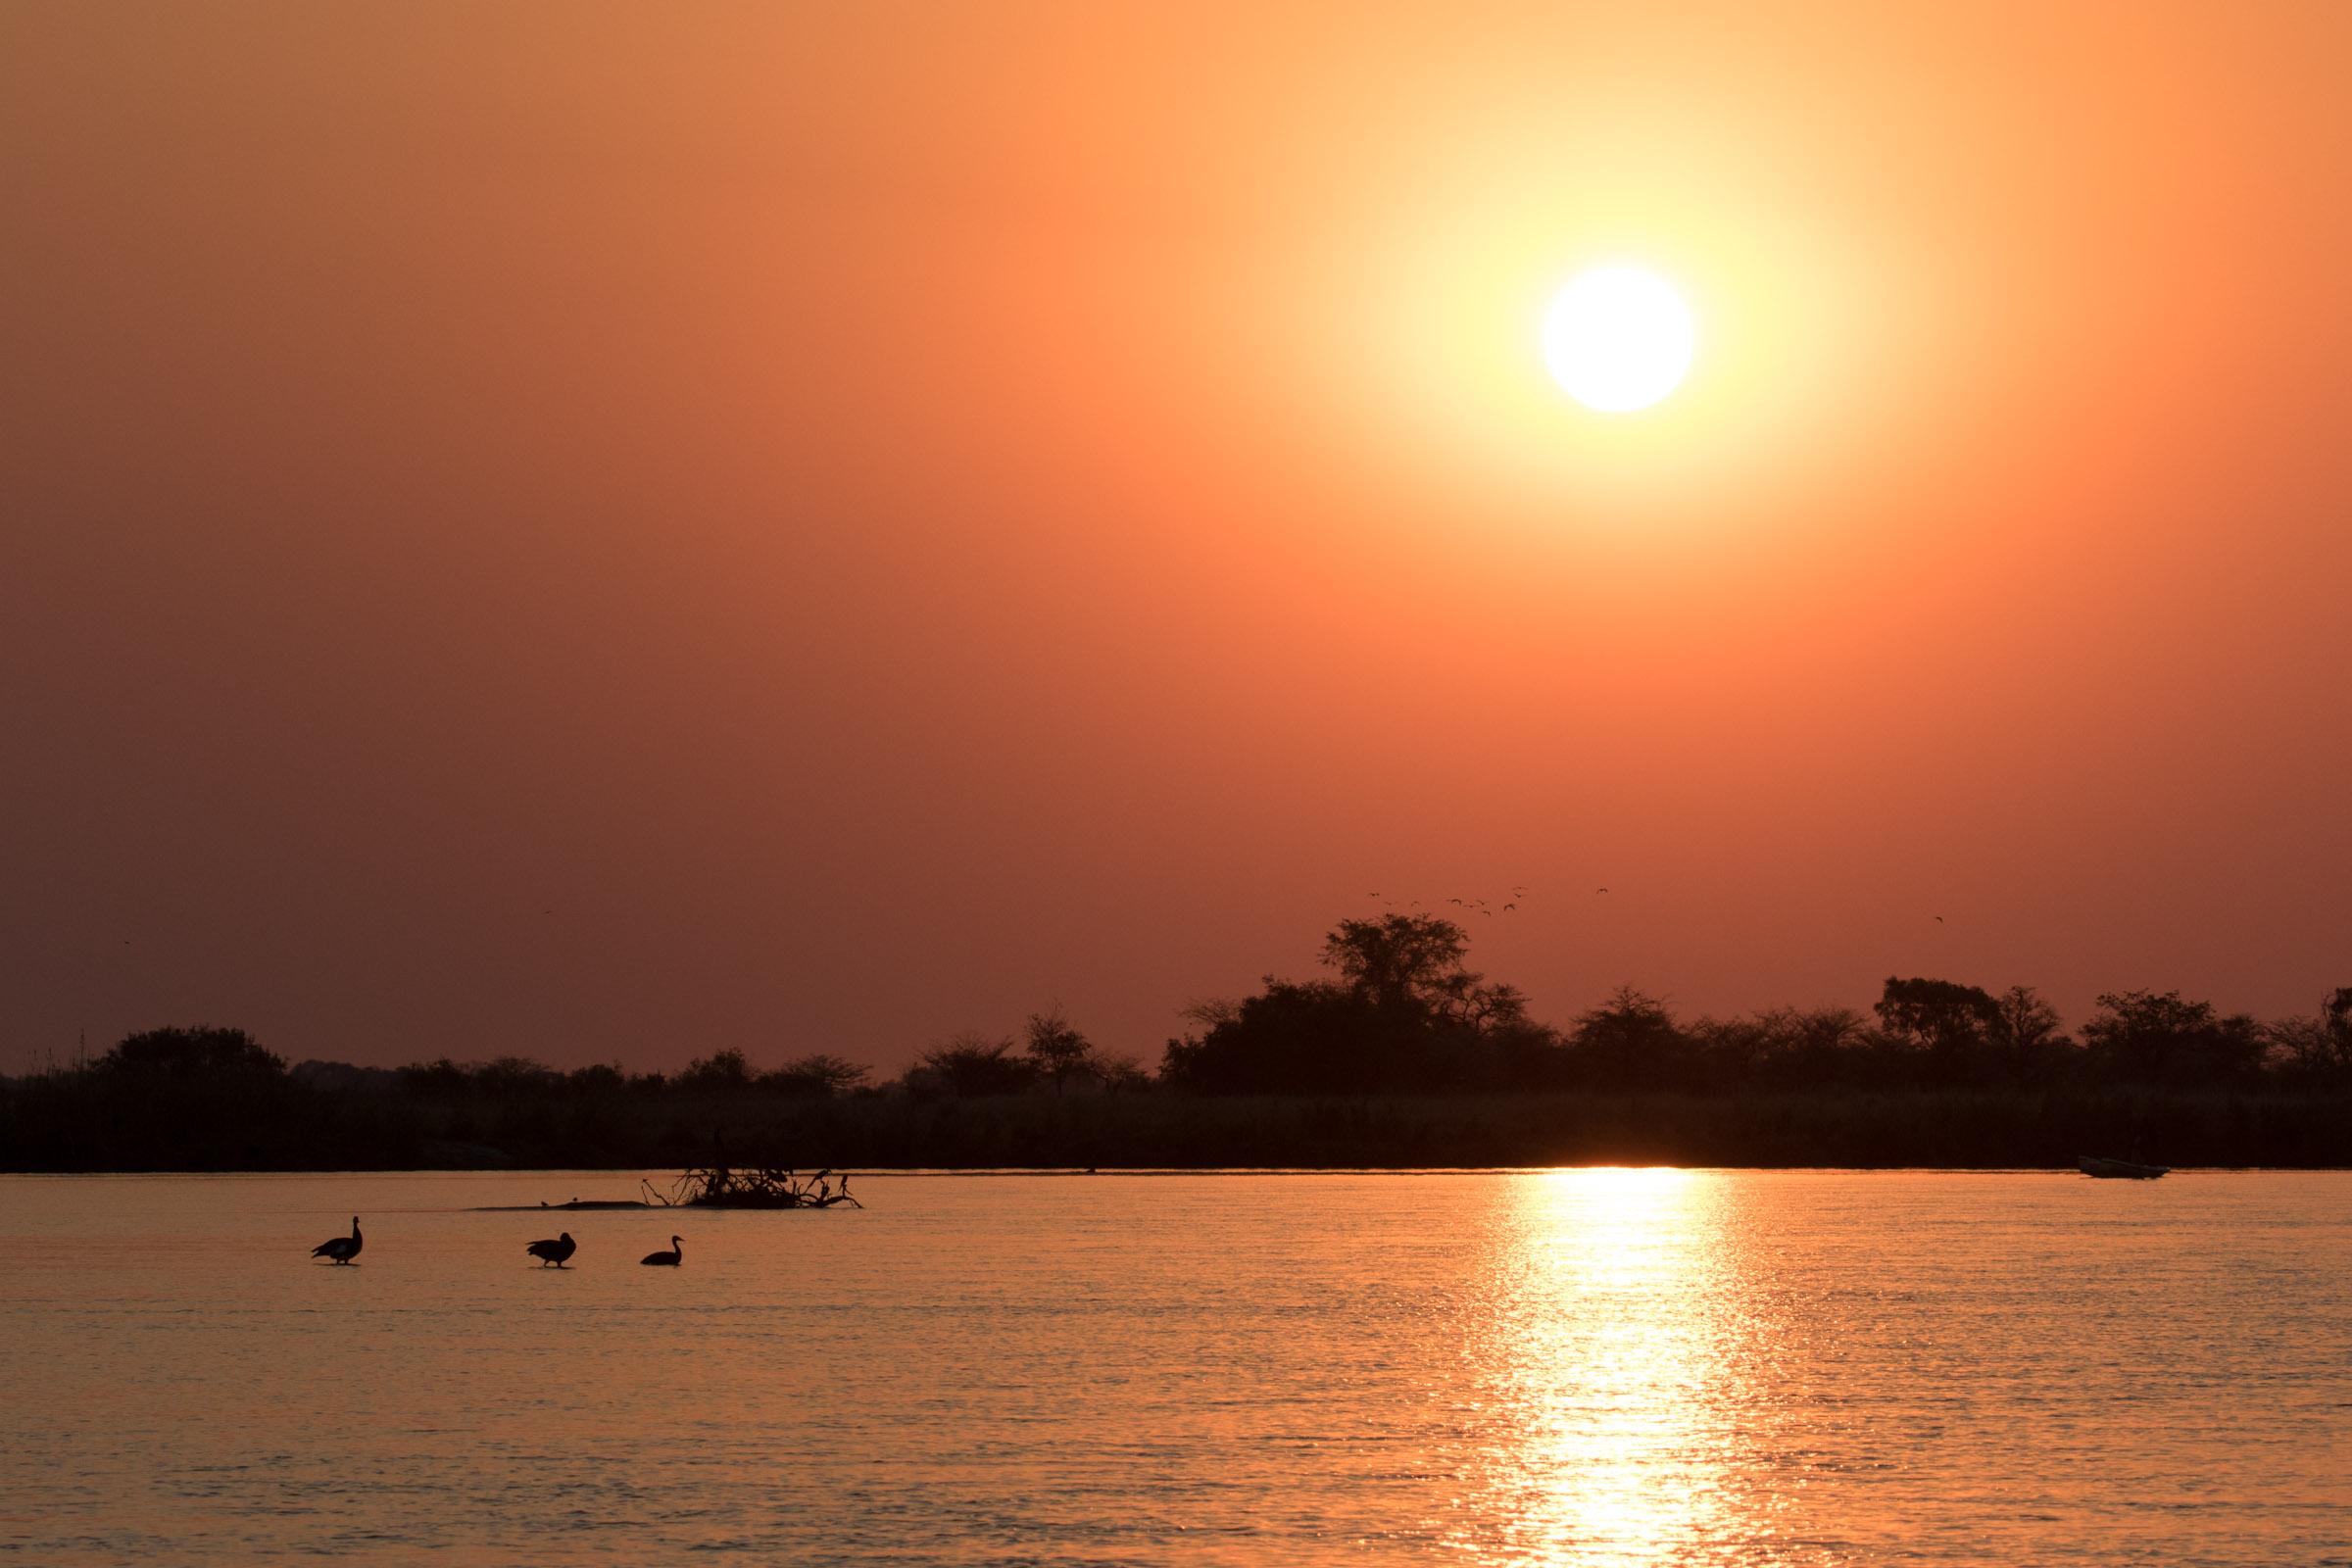 Sunset over the Okavango River